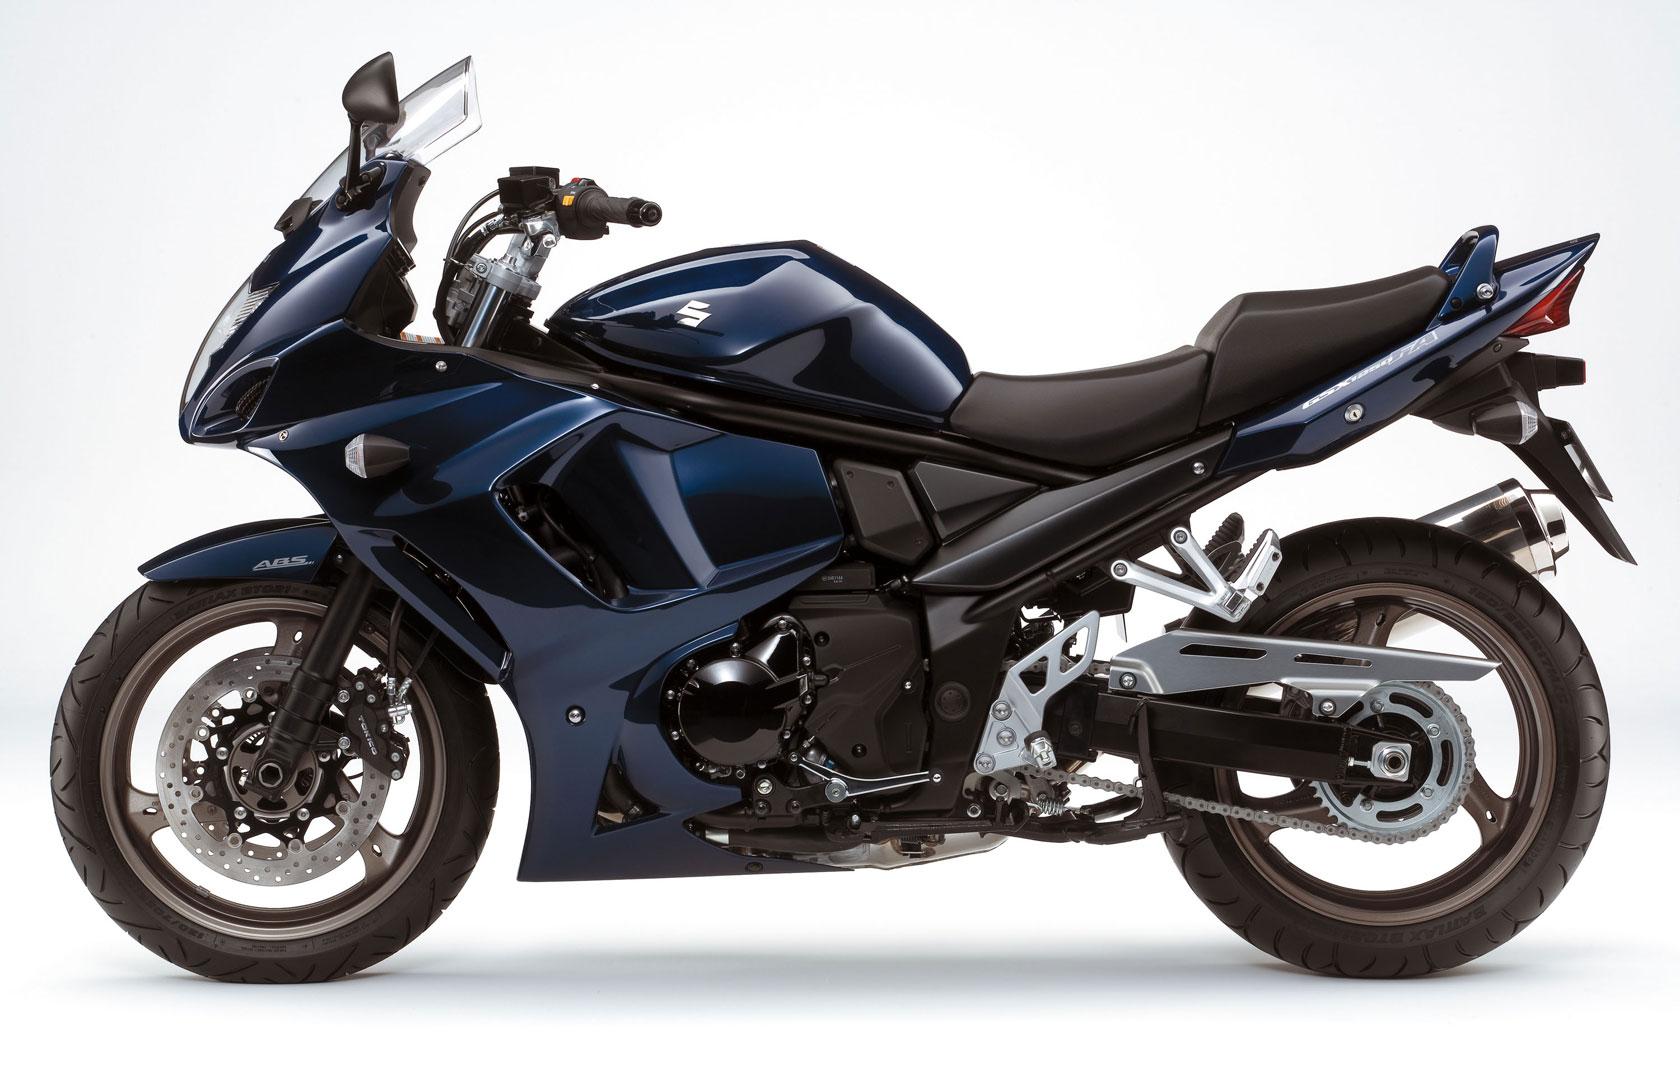 Honda Motorcycle Suzuki Gsxfa Sportbike Top 241056 Wallpaper wallpaper